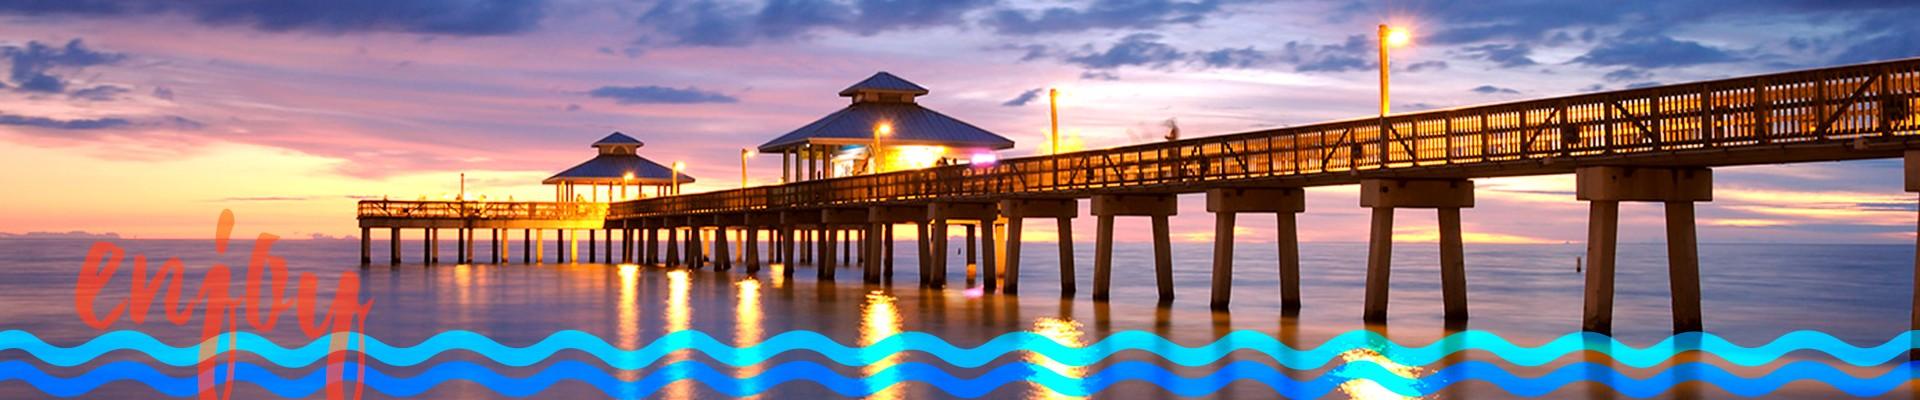 enjoy - Naples pier at Naples Motorcoach Resort & Boat Club